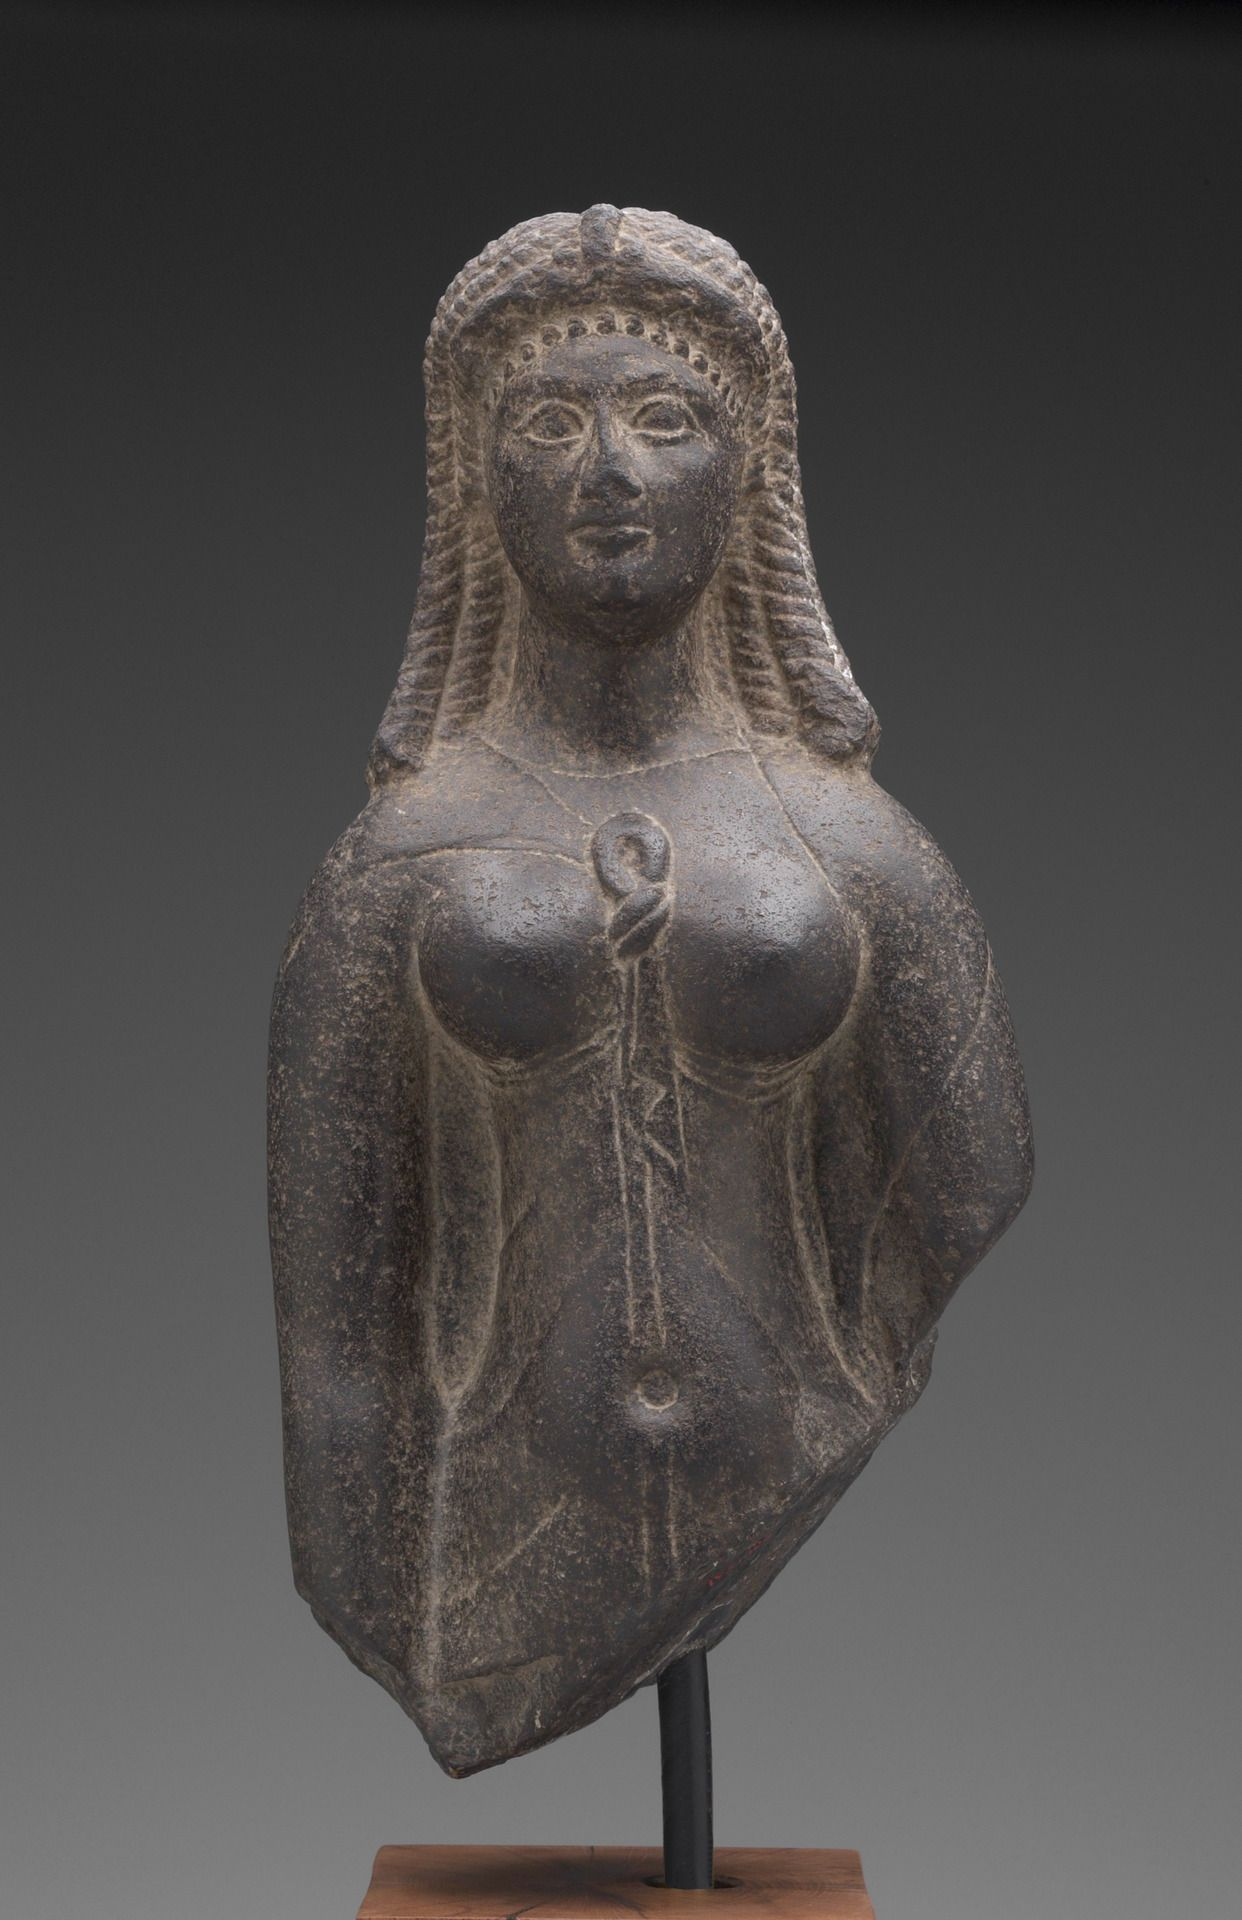 Pin Ancient Art And Artifact